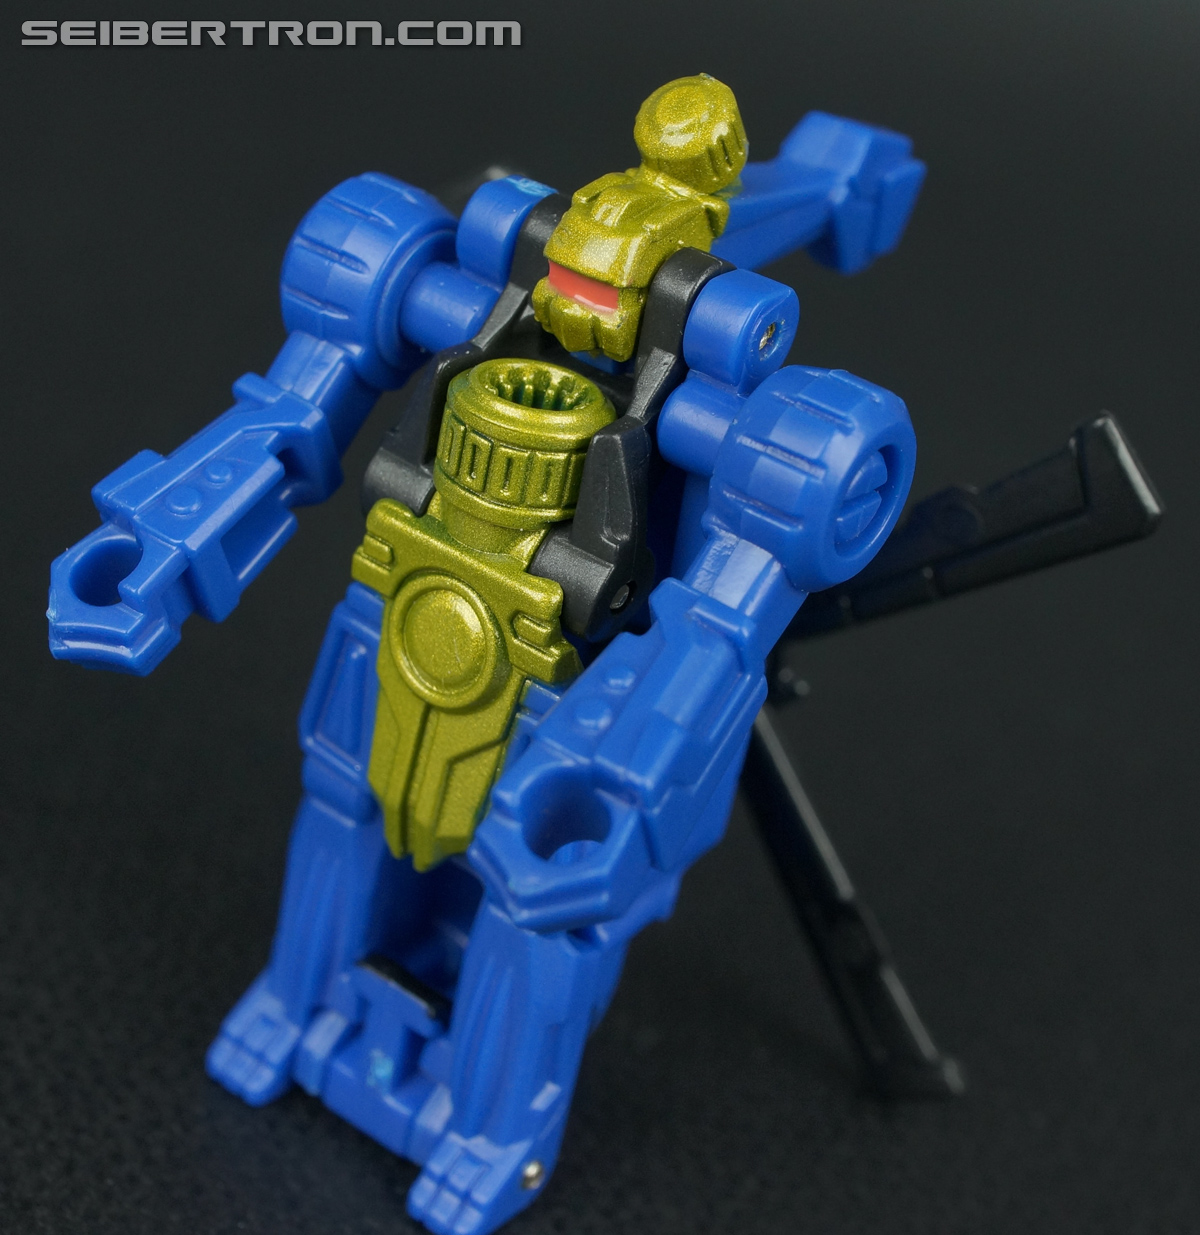 Transformers Generations Blazemaster (Image #54 of 69)